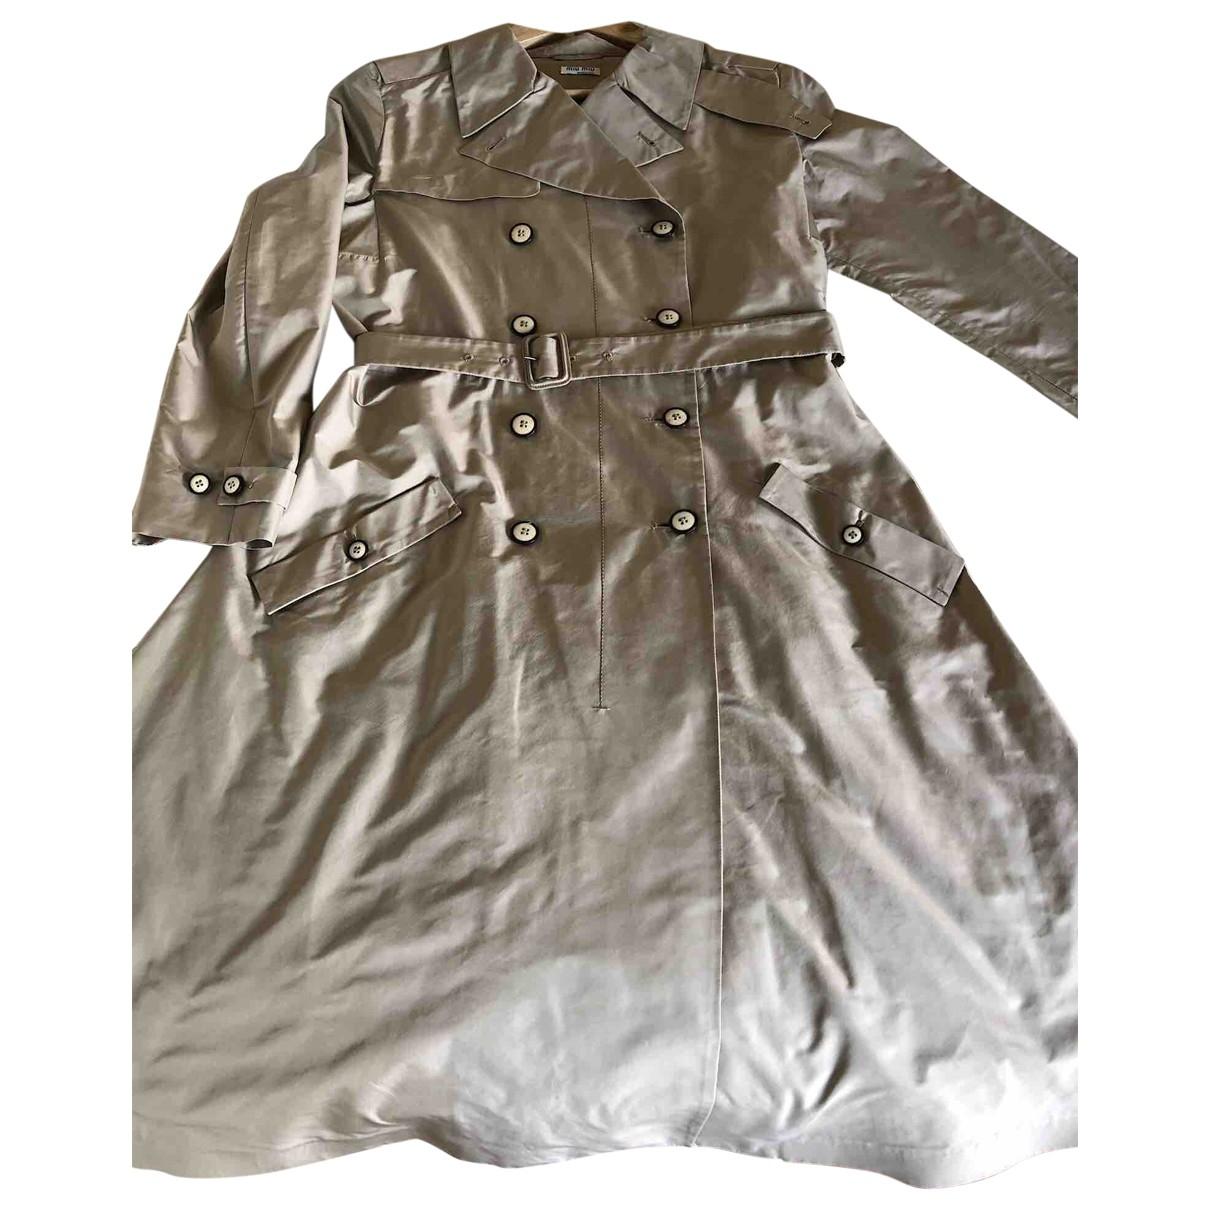 Miu Miu \N Beige Trench coat for Women 44 IT